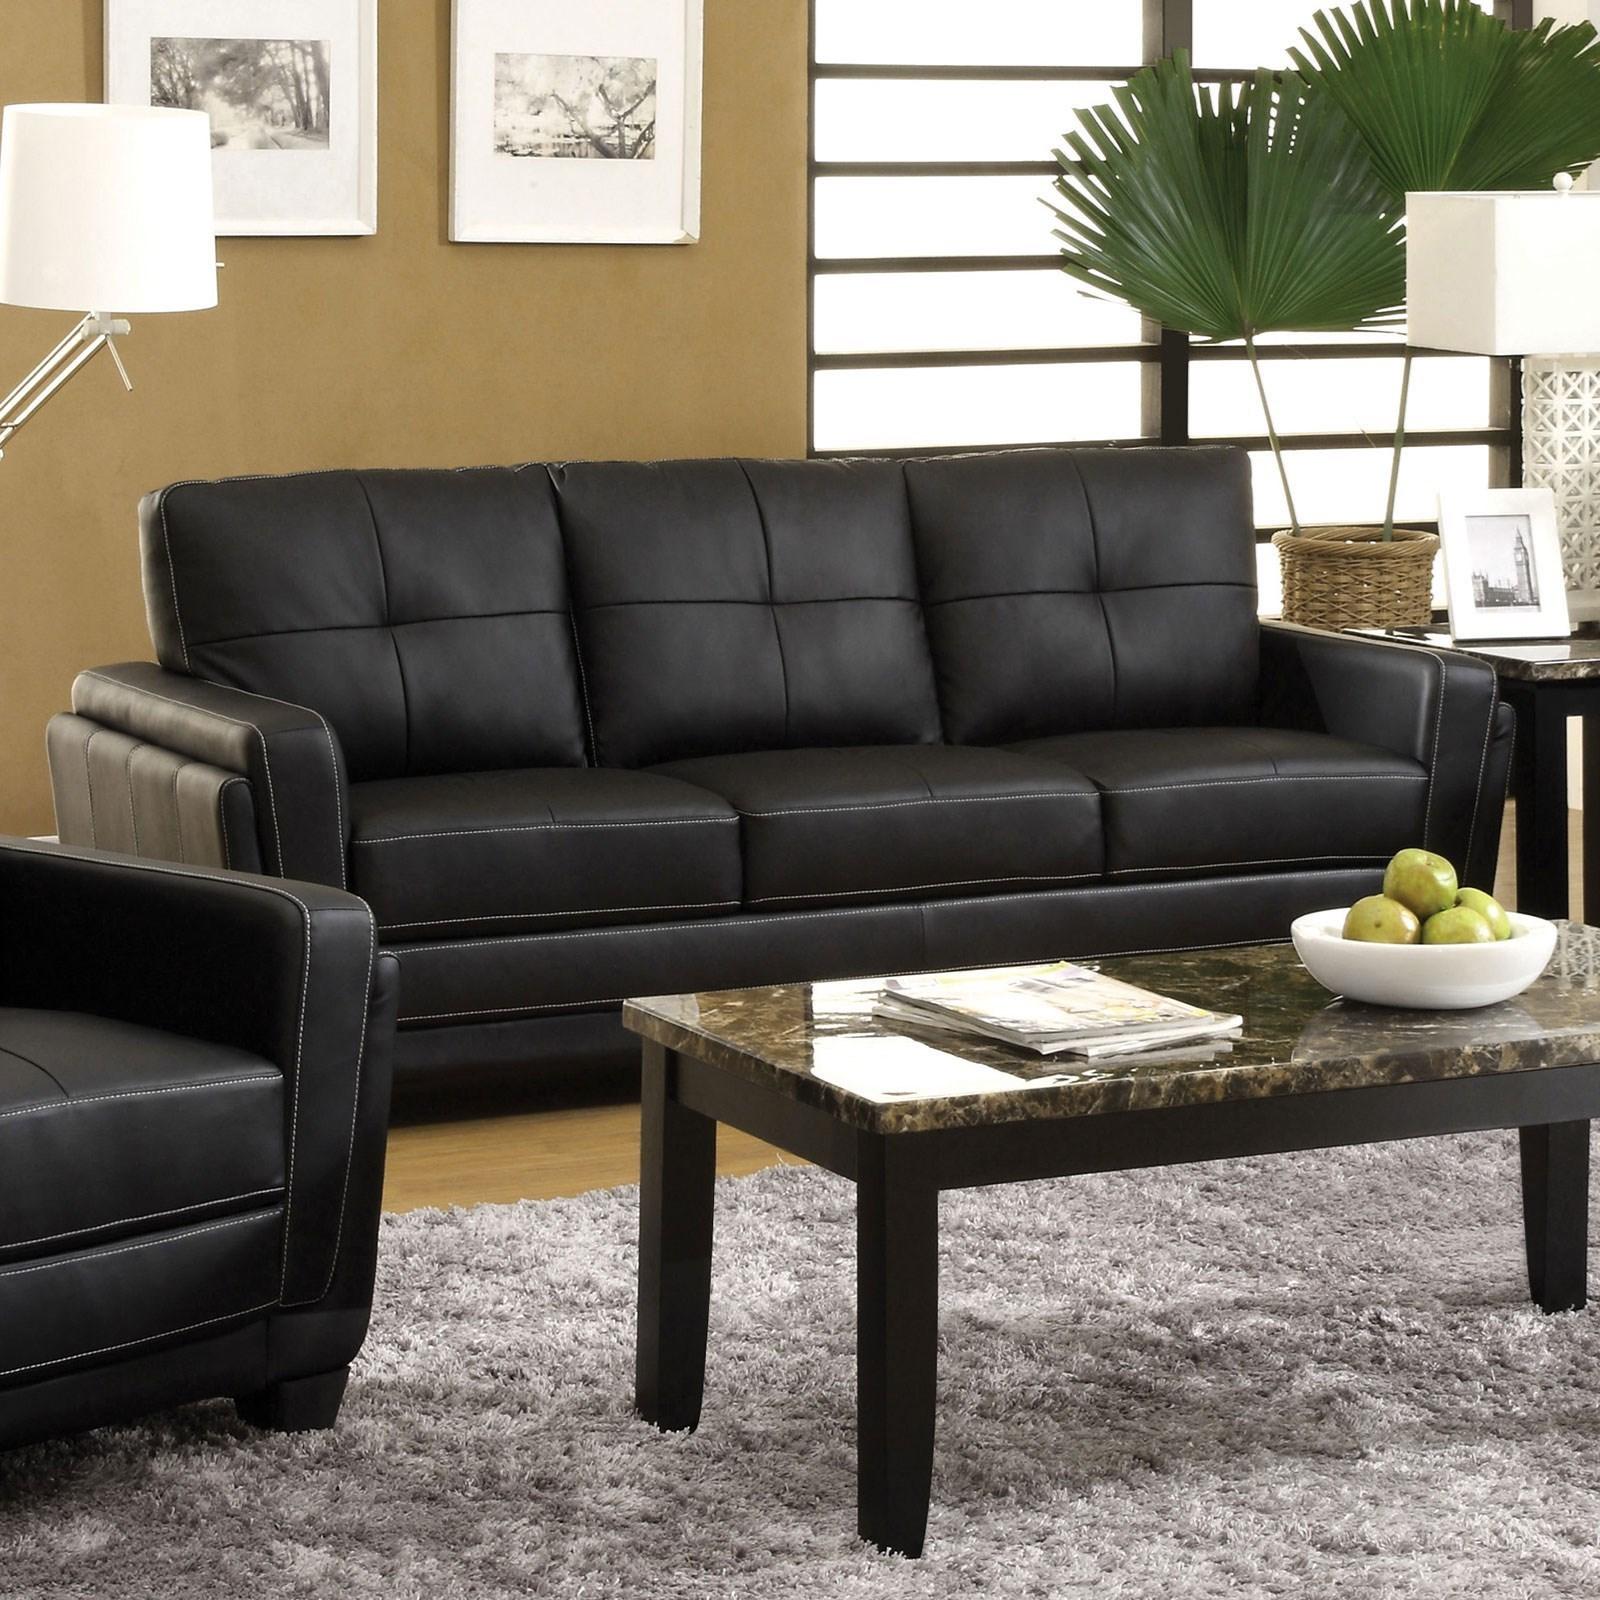 Blacksburg Sofa at Household Furniture